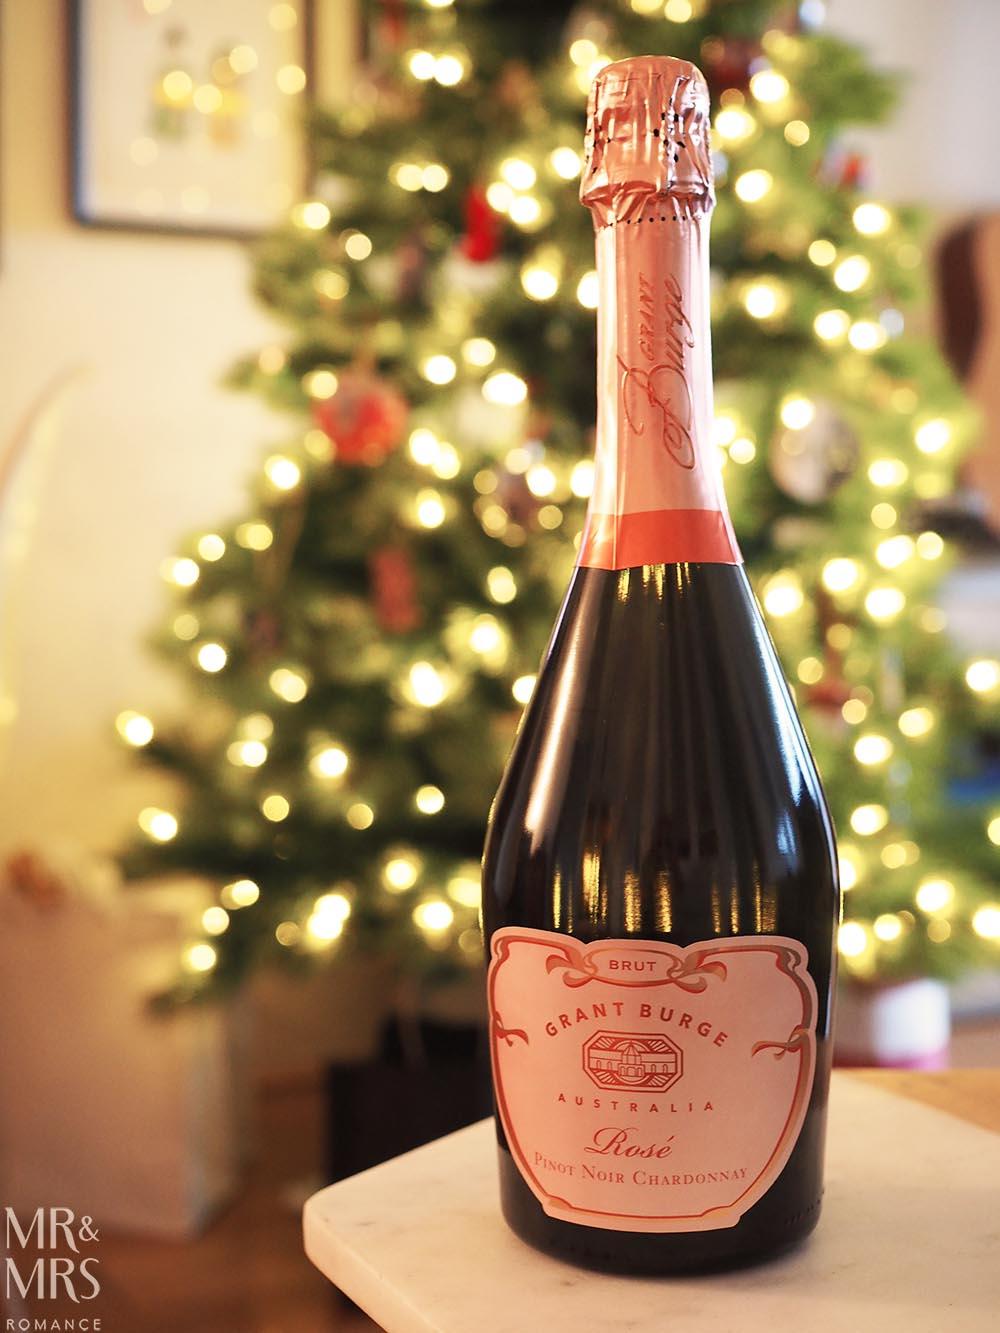 Australian sparkling for Christmas - Grant Burge NV Sparkling Pinot Noir Chardonnay Rosé